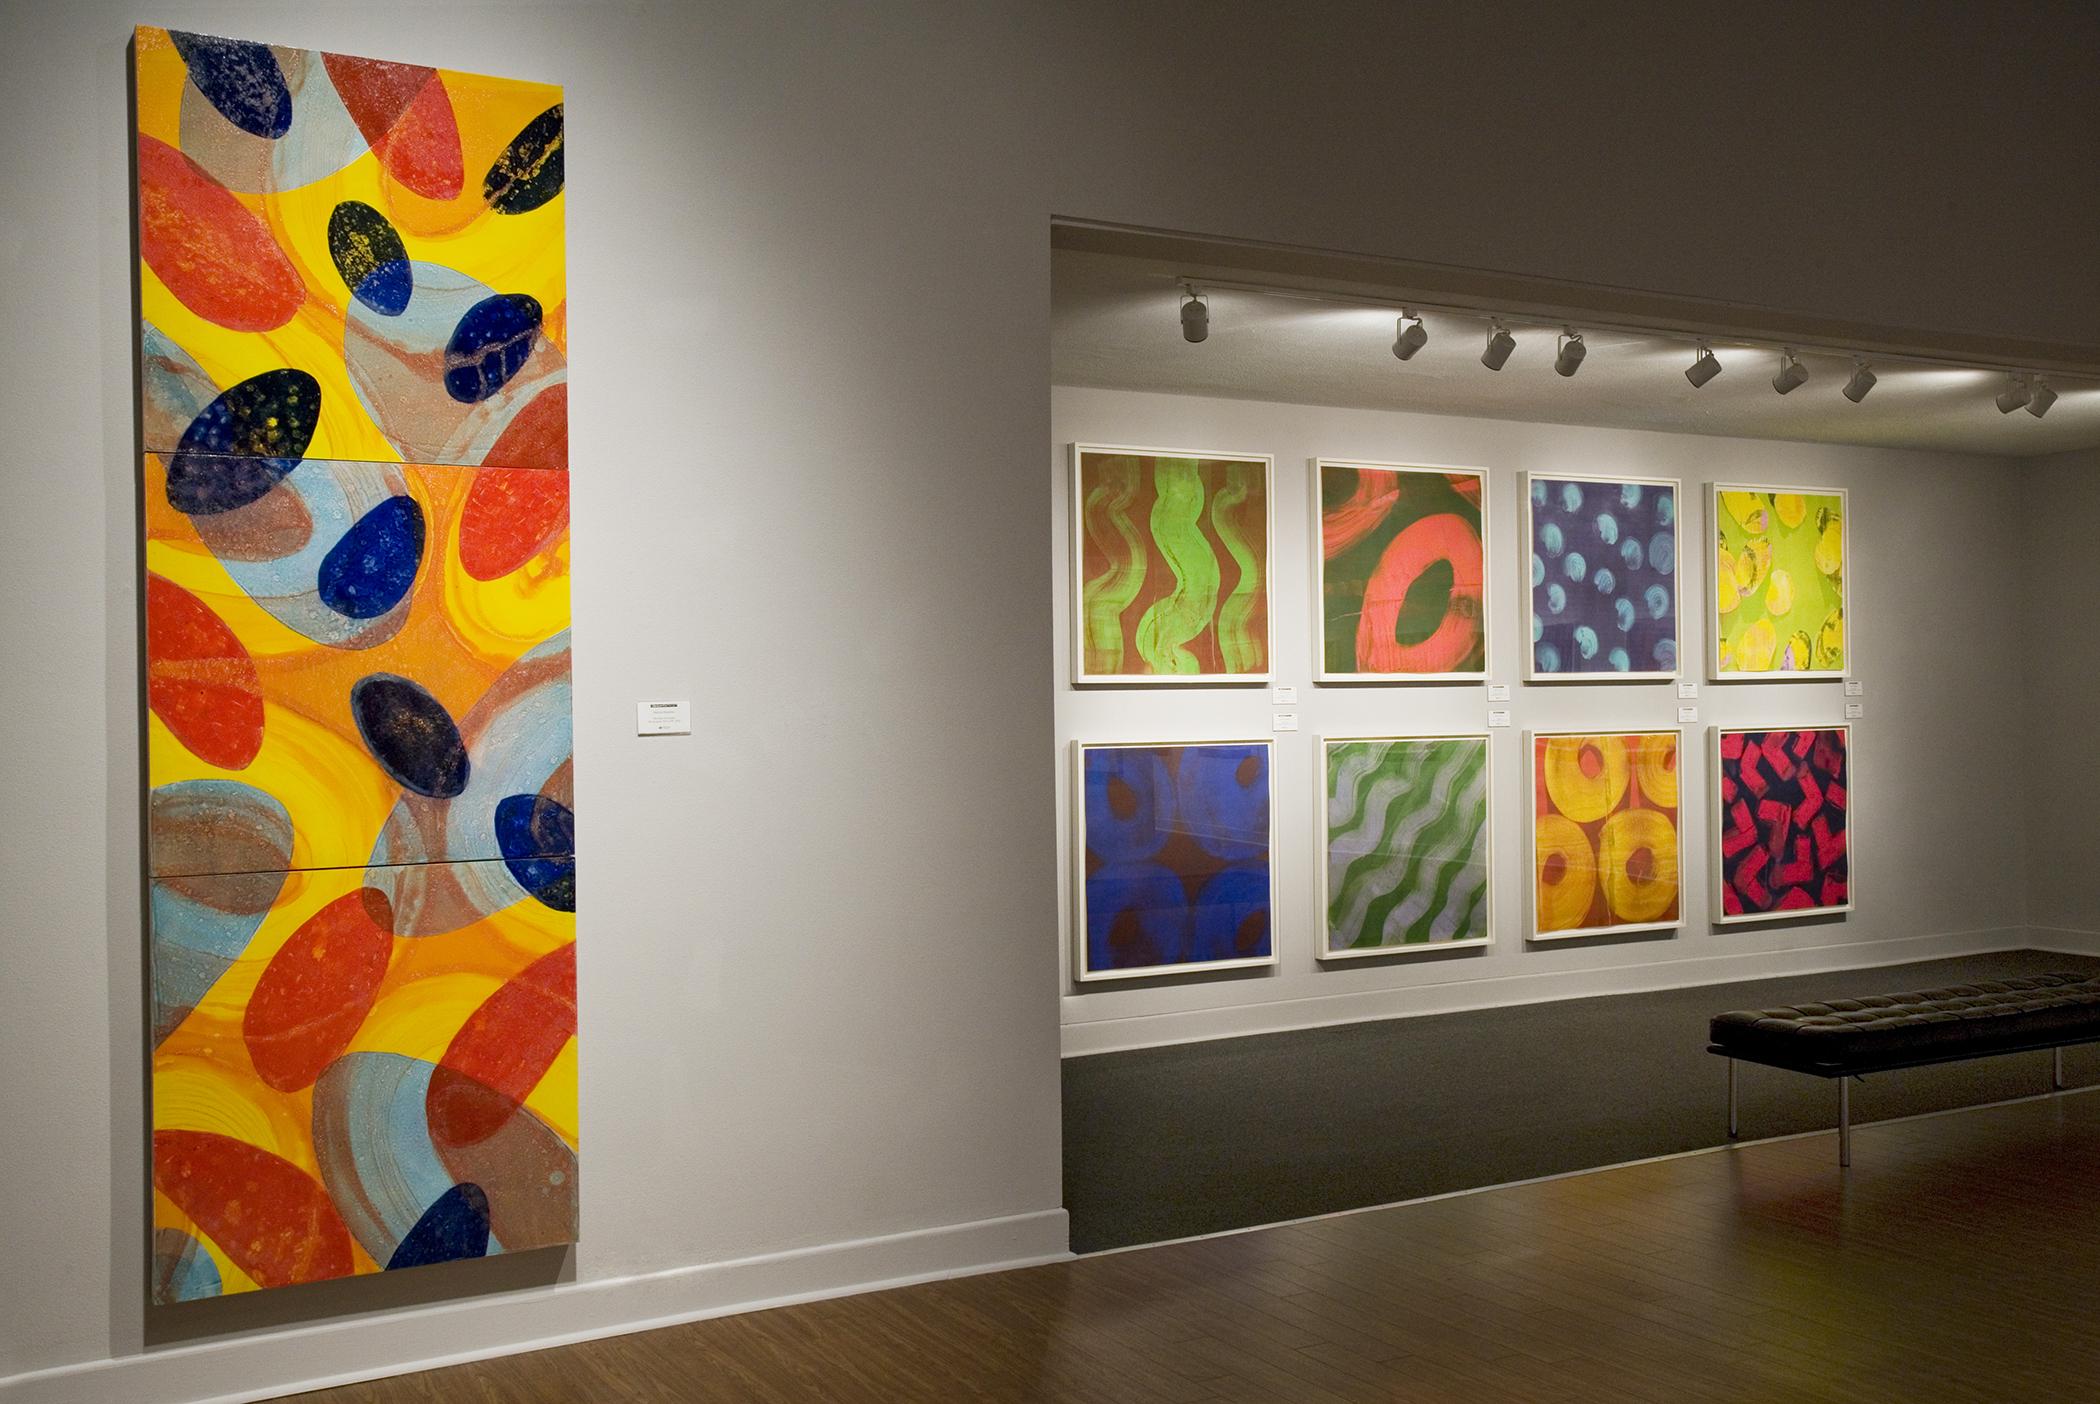 marylyn-dintenfass-bob-rauschenberg-gallery-parallel-park-1